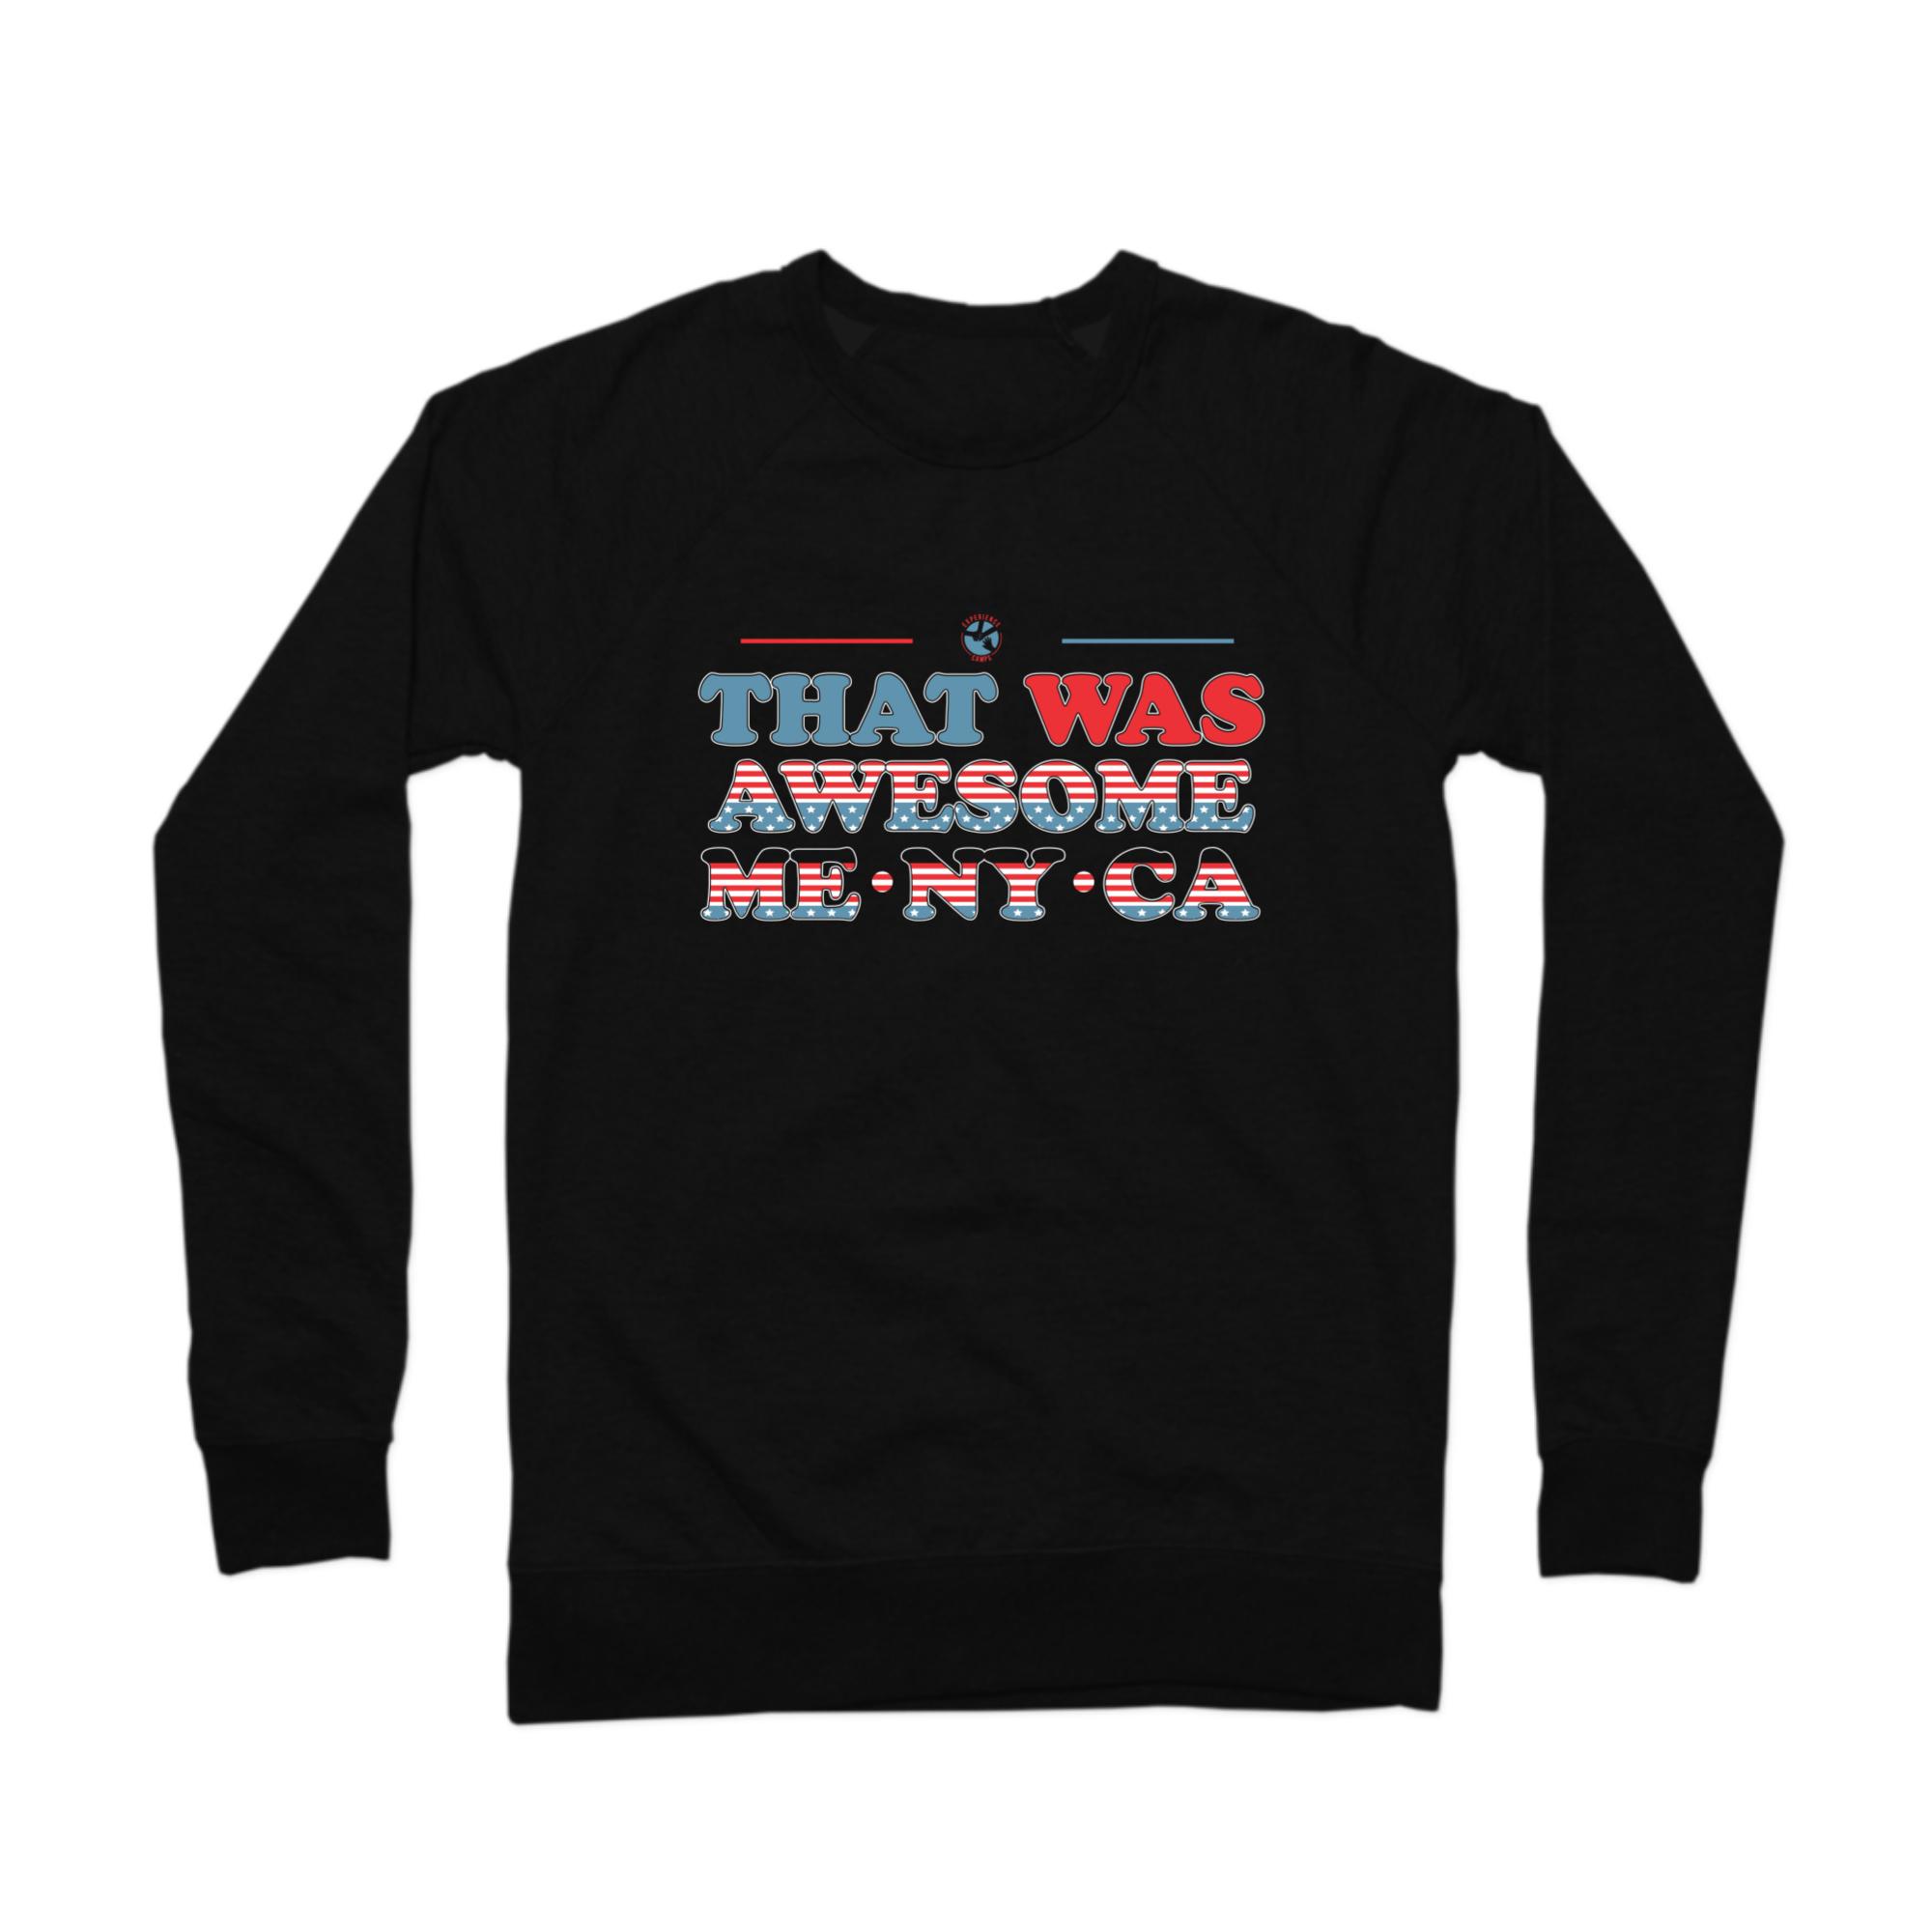 That Was Awesome Crewneck Sweatshirt